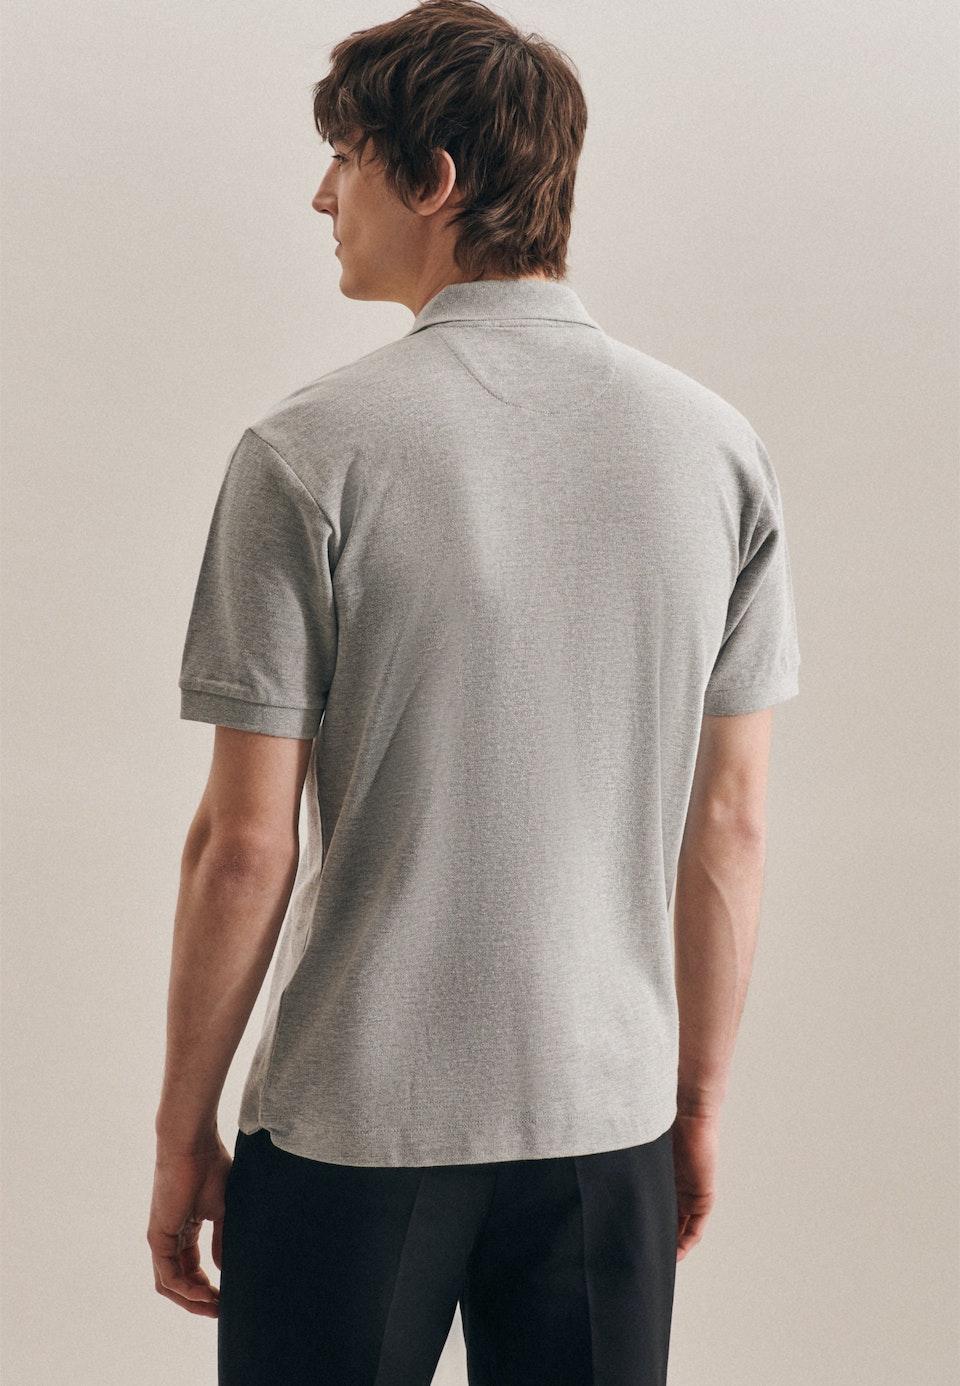 Polo-Shirt Regular made of 100% Cotton in Grey |  Seidensticker Onlineshop